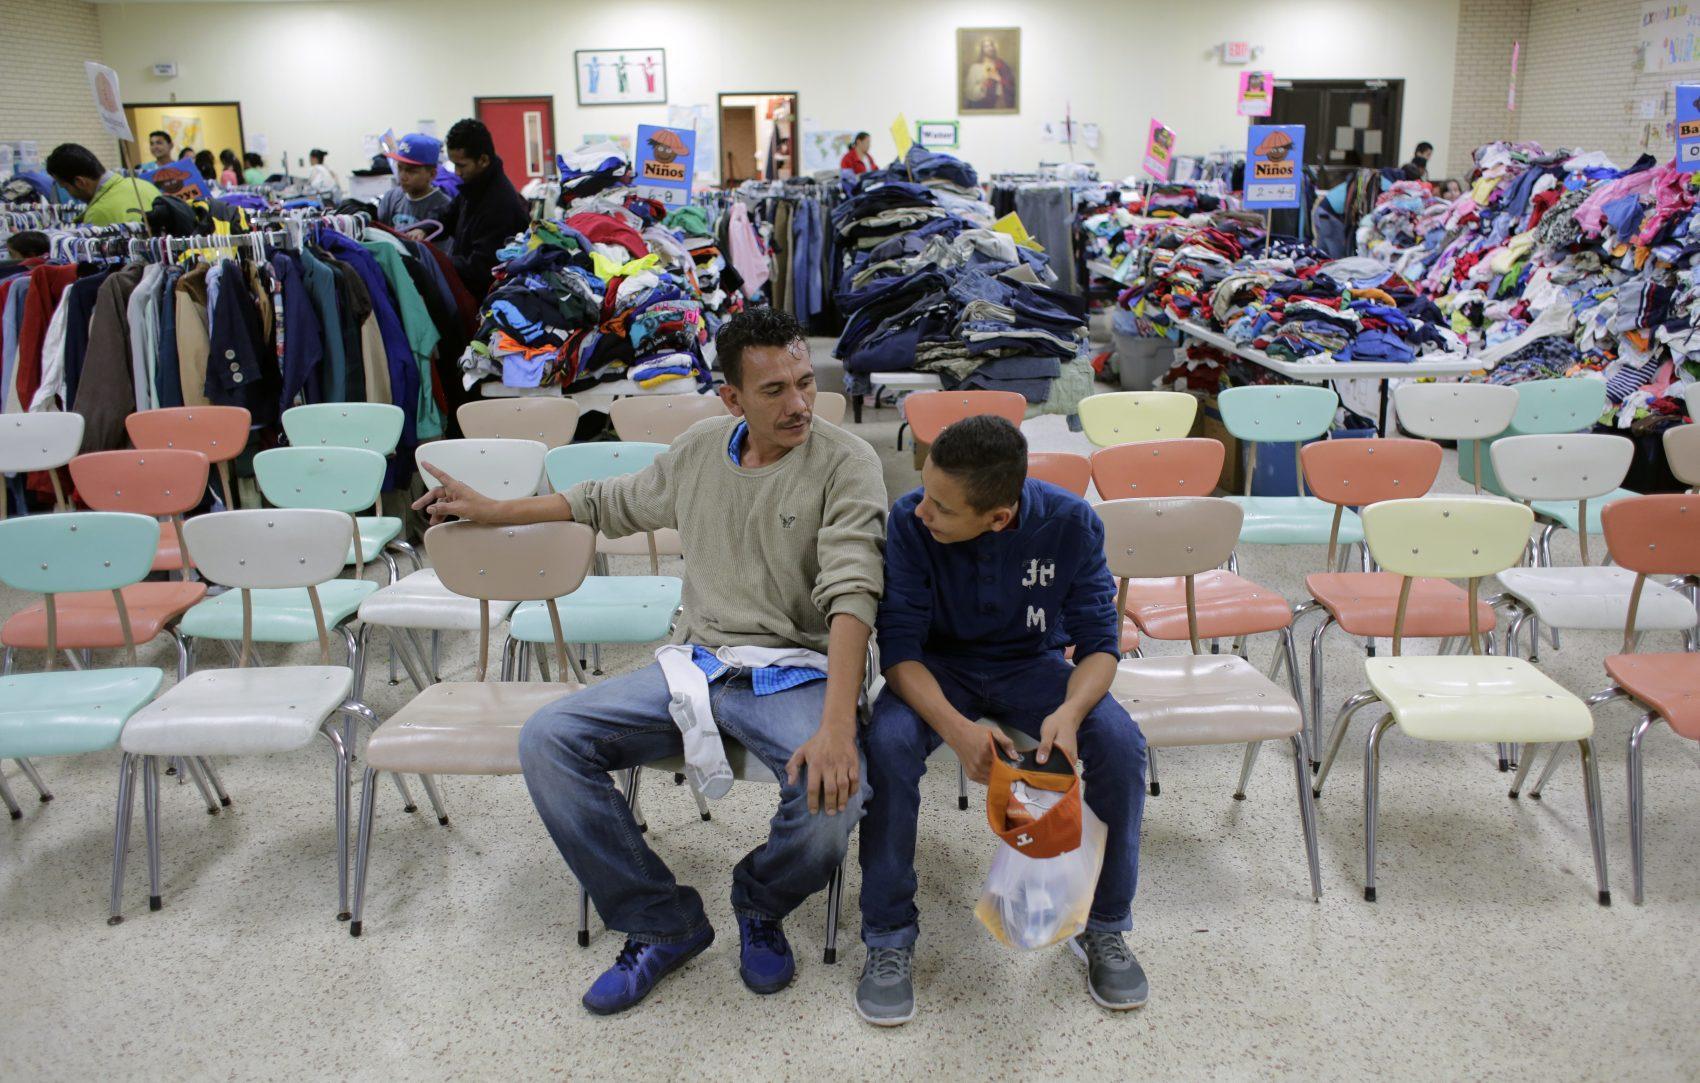 Jobs For 15 Year Olds In Mcallen Texas